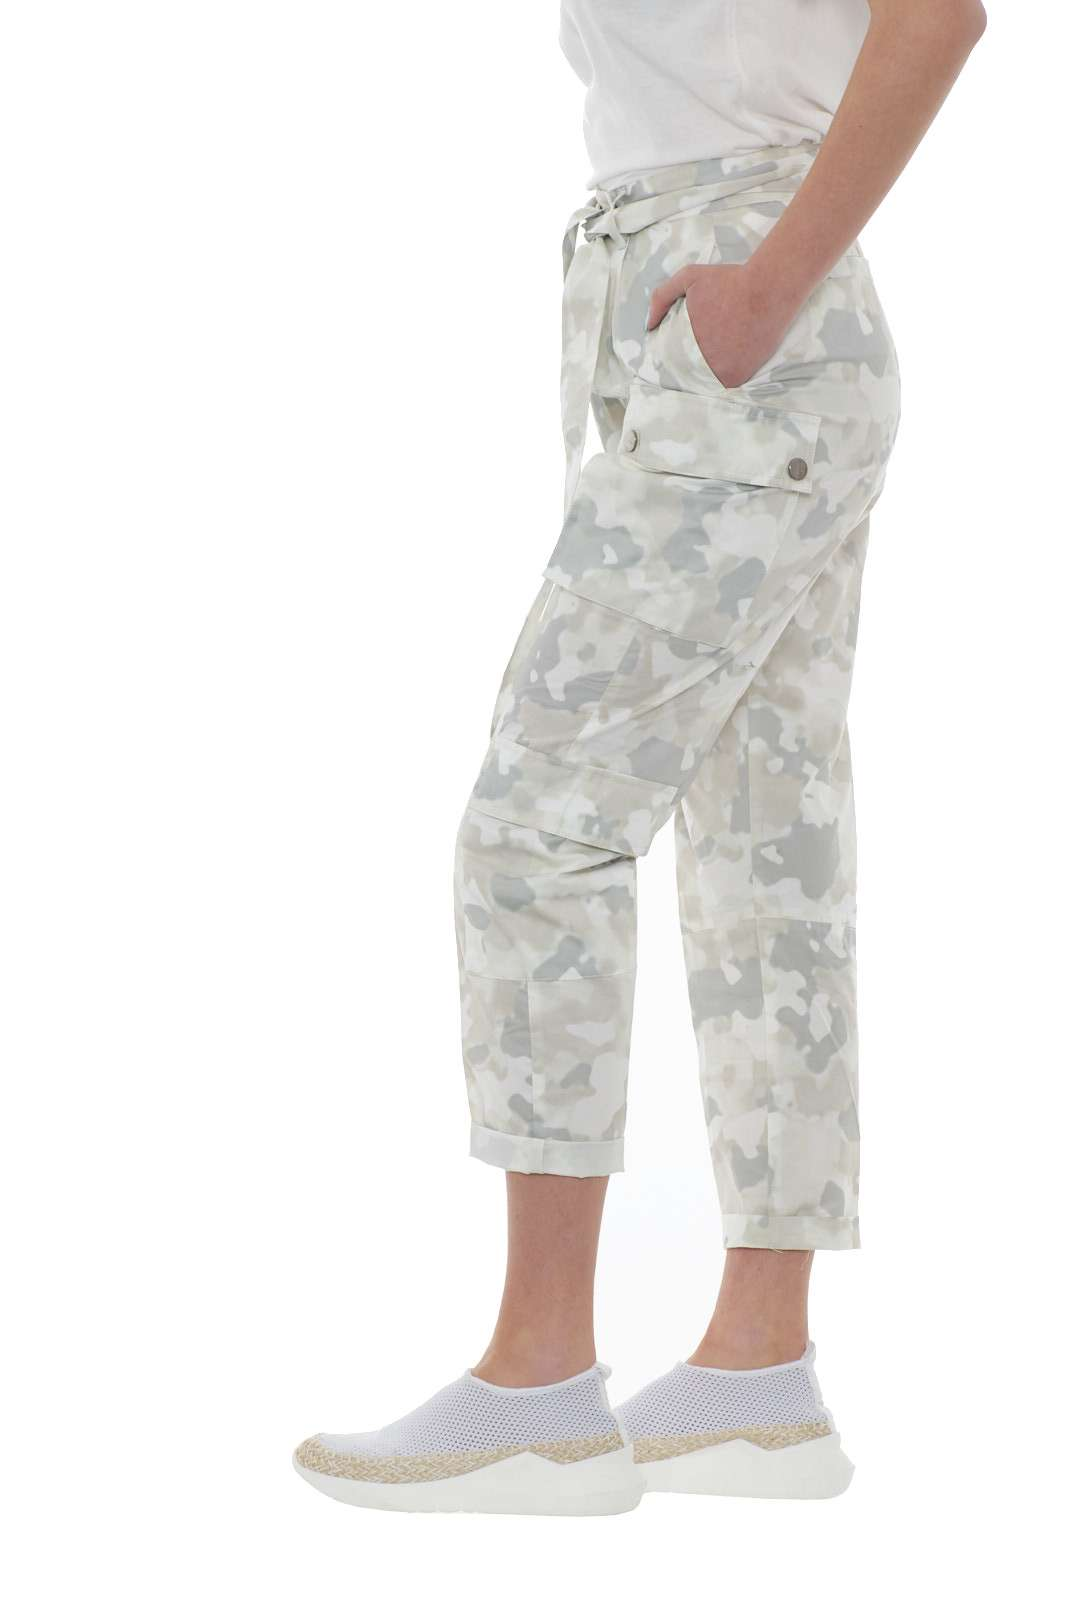 https://www.parmax.com/media/catalog/product/a/i/PE-outlet_parmax-pantaloni-donna-Pinko-1b14fn-B.jpg